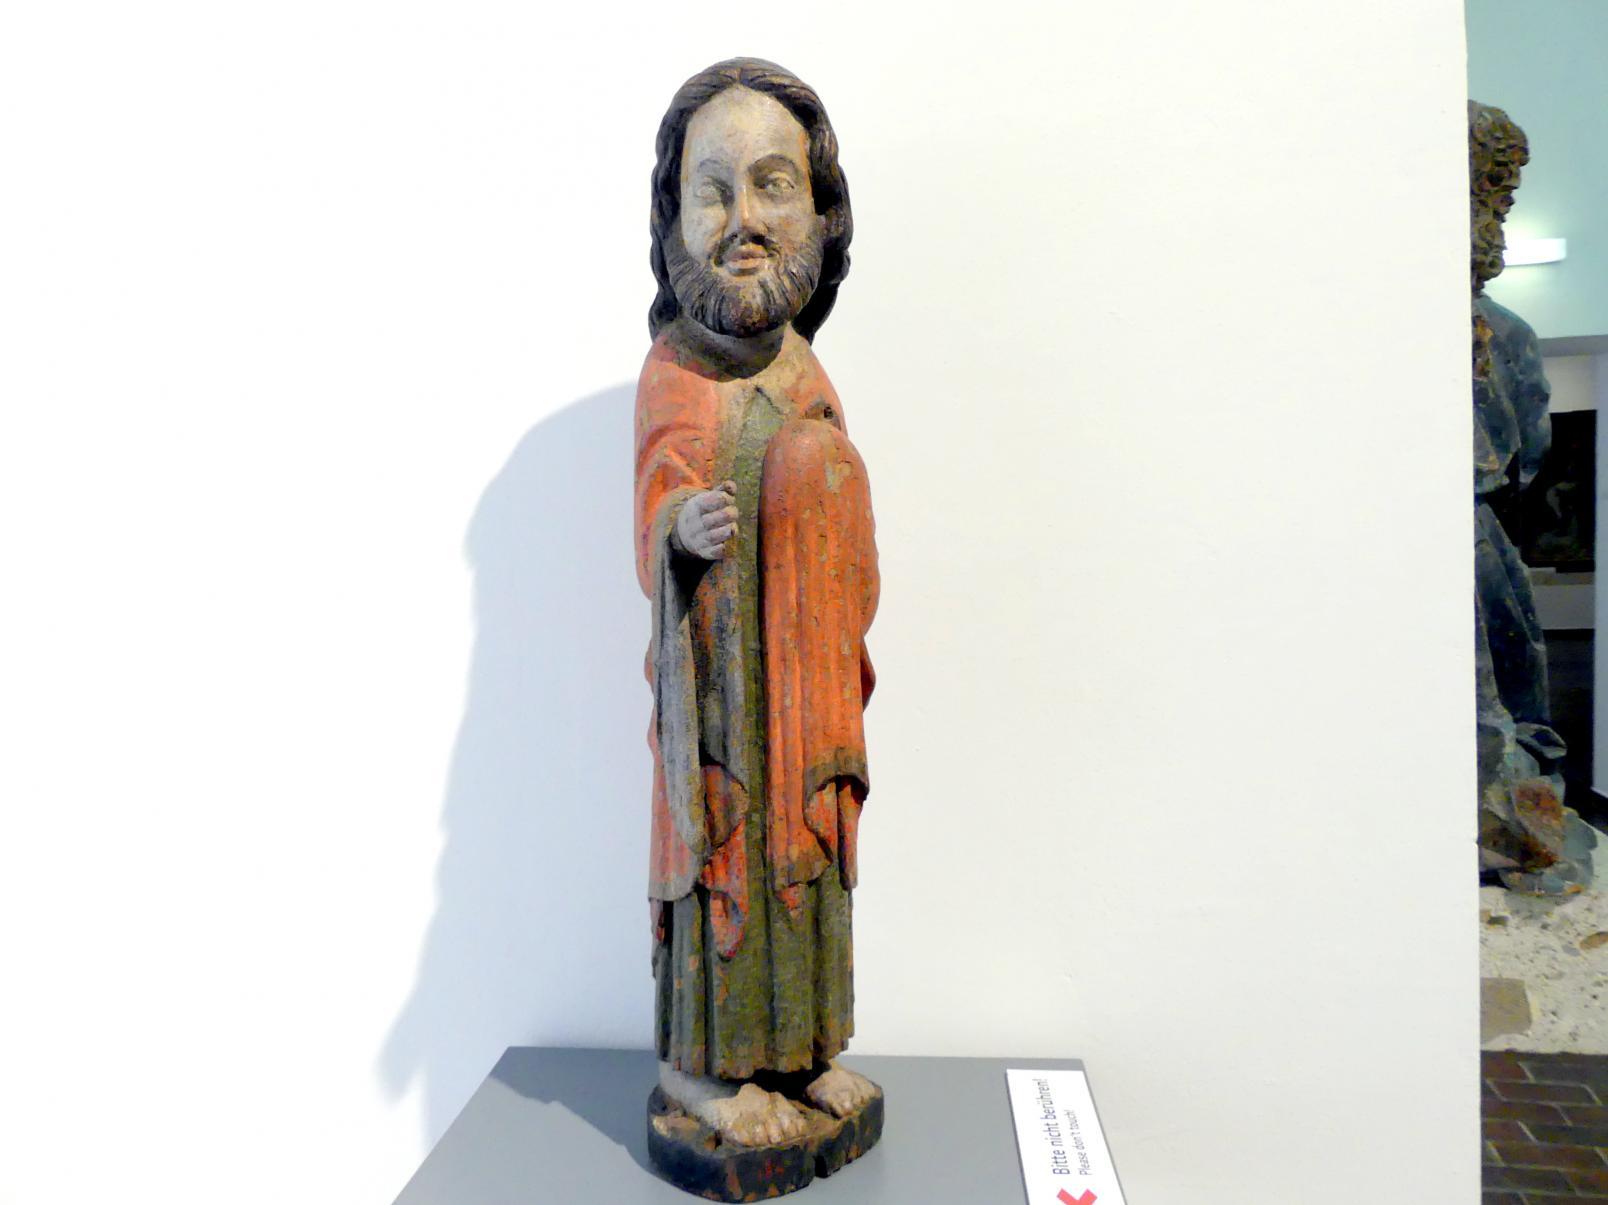 Christus oder Apostel, Beginn 14. Jhd.